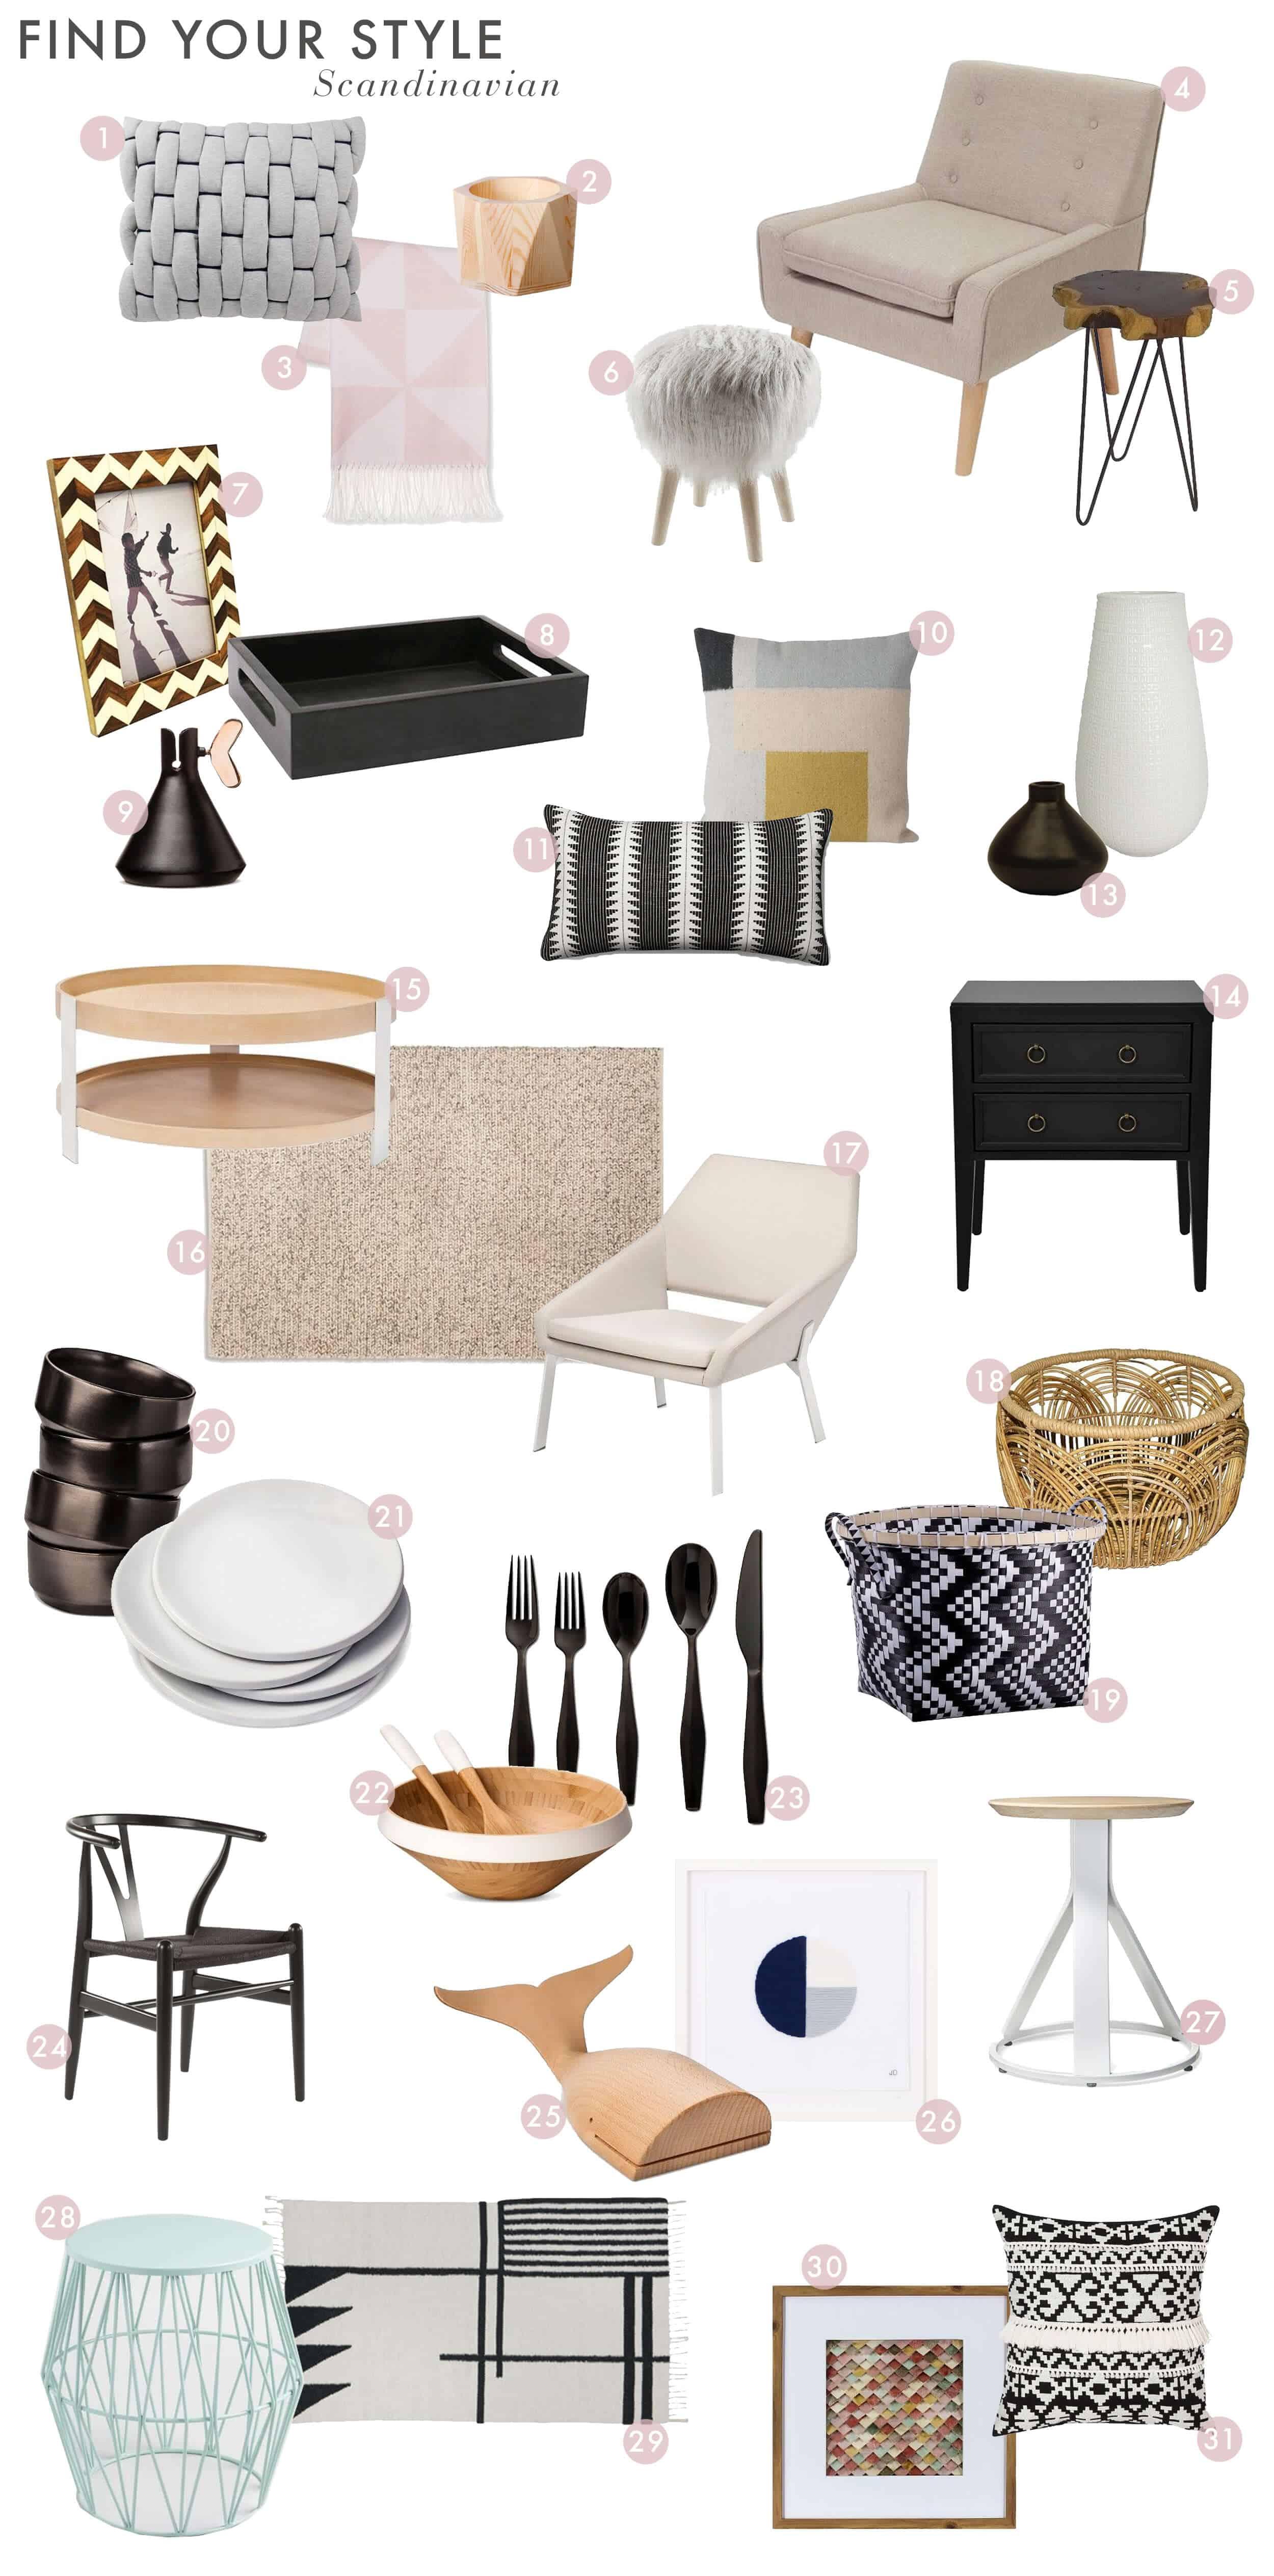 Emily Henderson_Find Your Style_Style Quiz_Vignettes_Minimal_Sleek_White_Modern_Roundup_Scandinavian